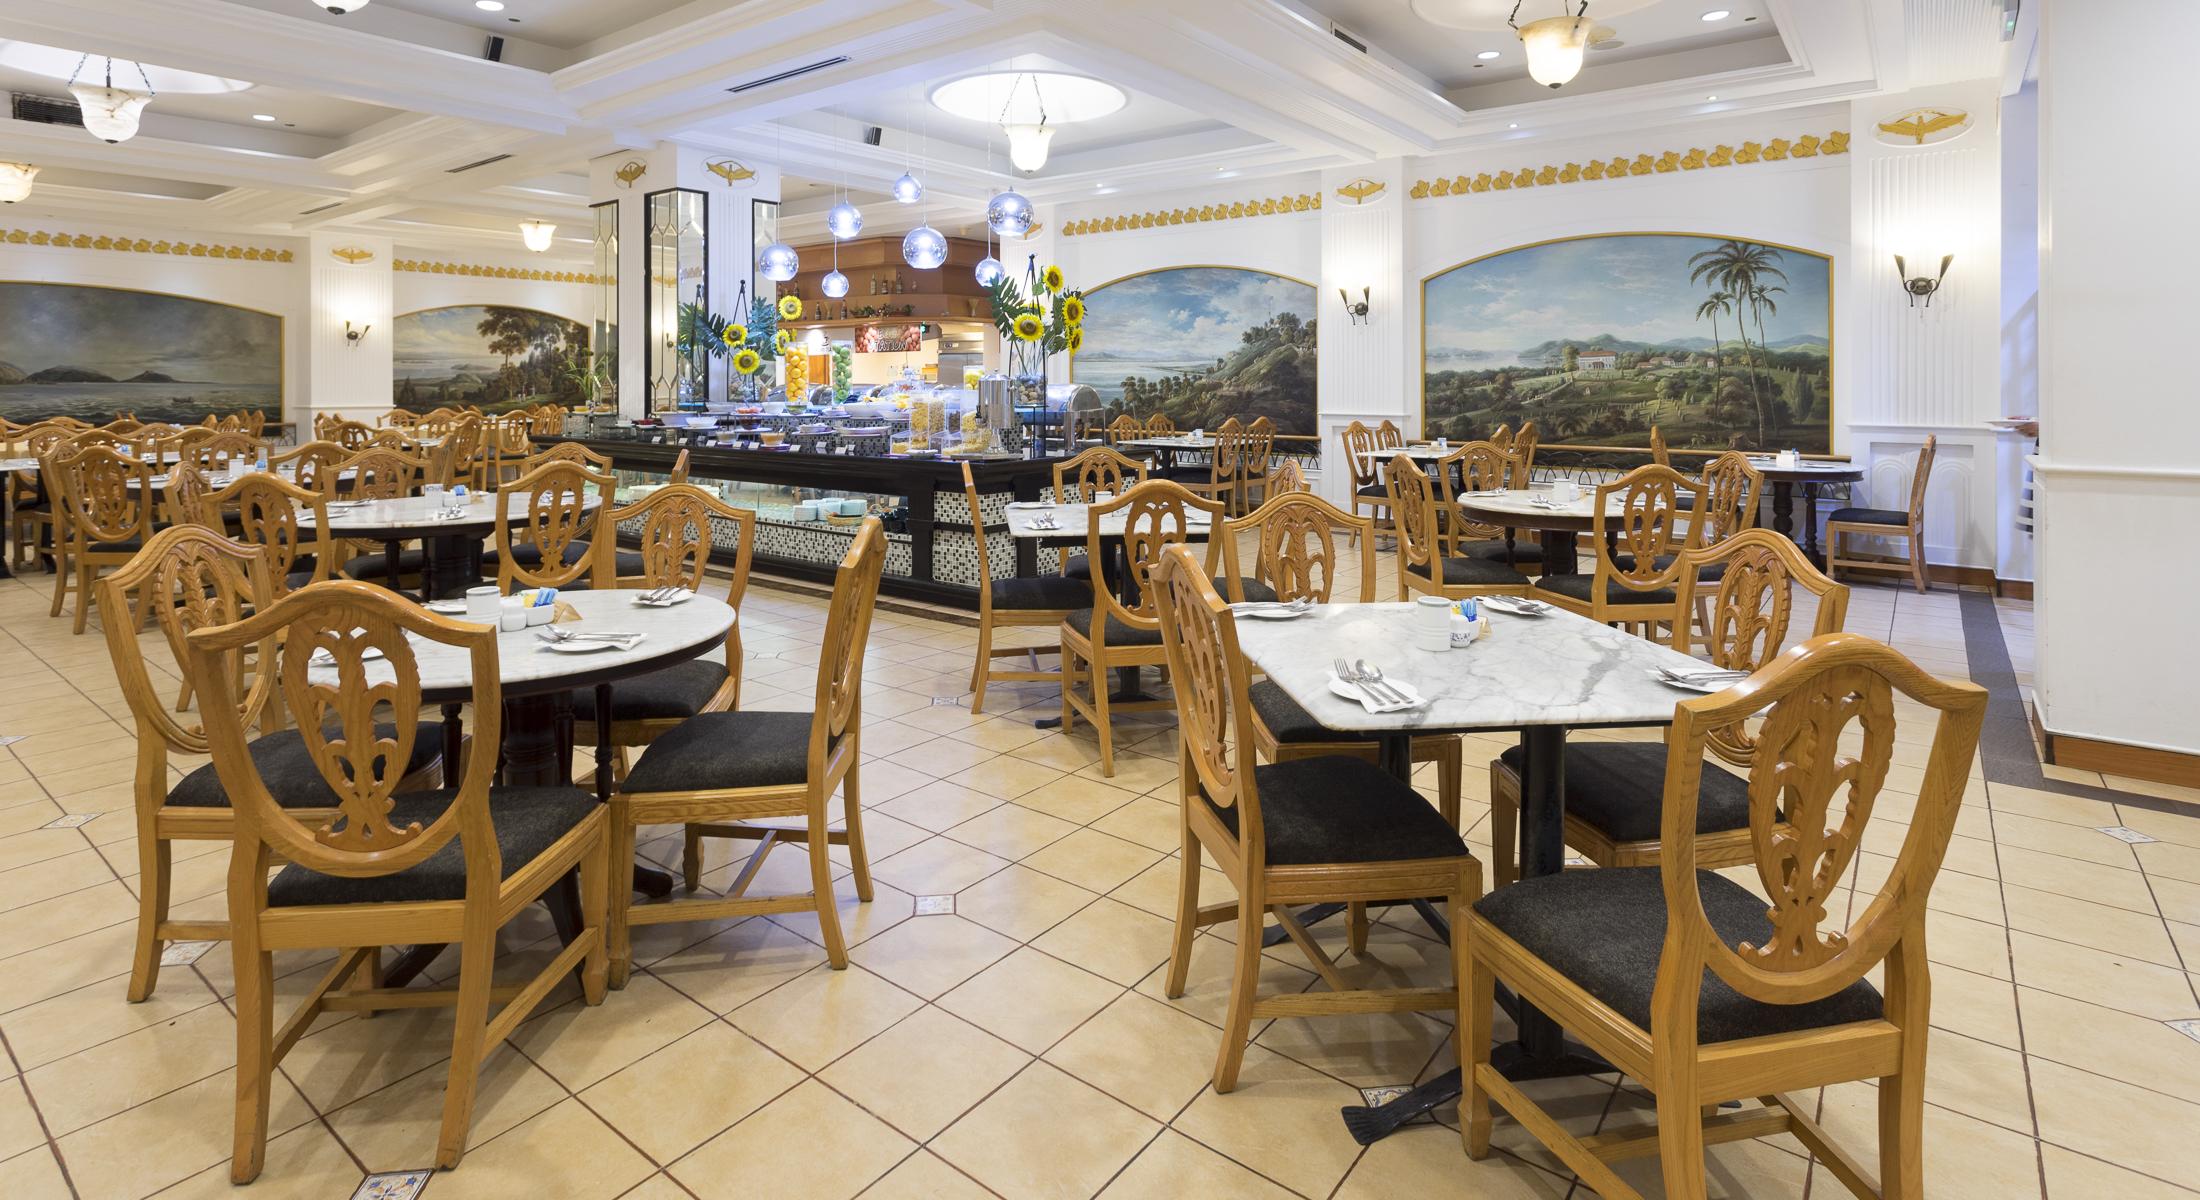 Restaurants Bars Penang Hotel